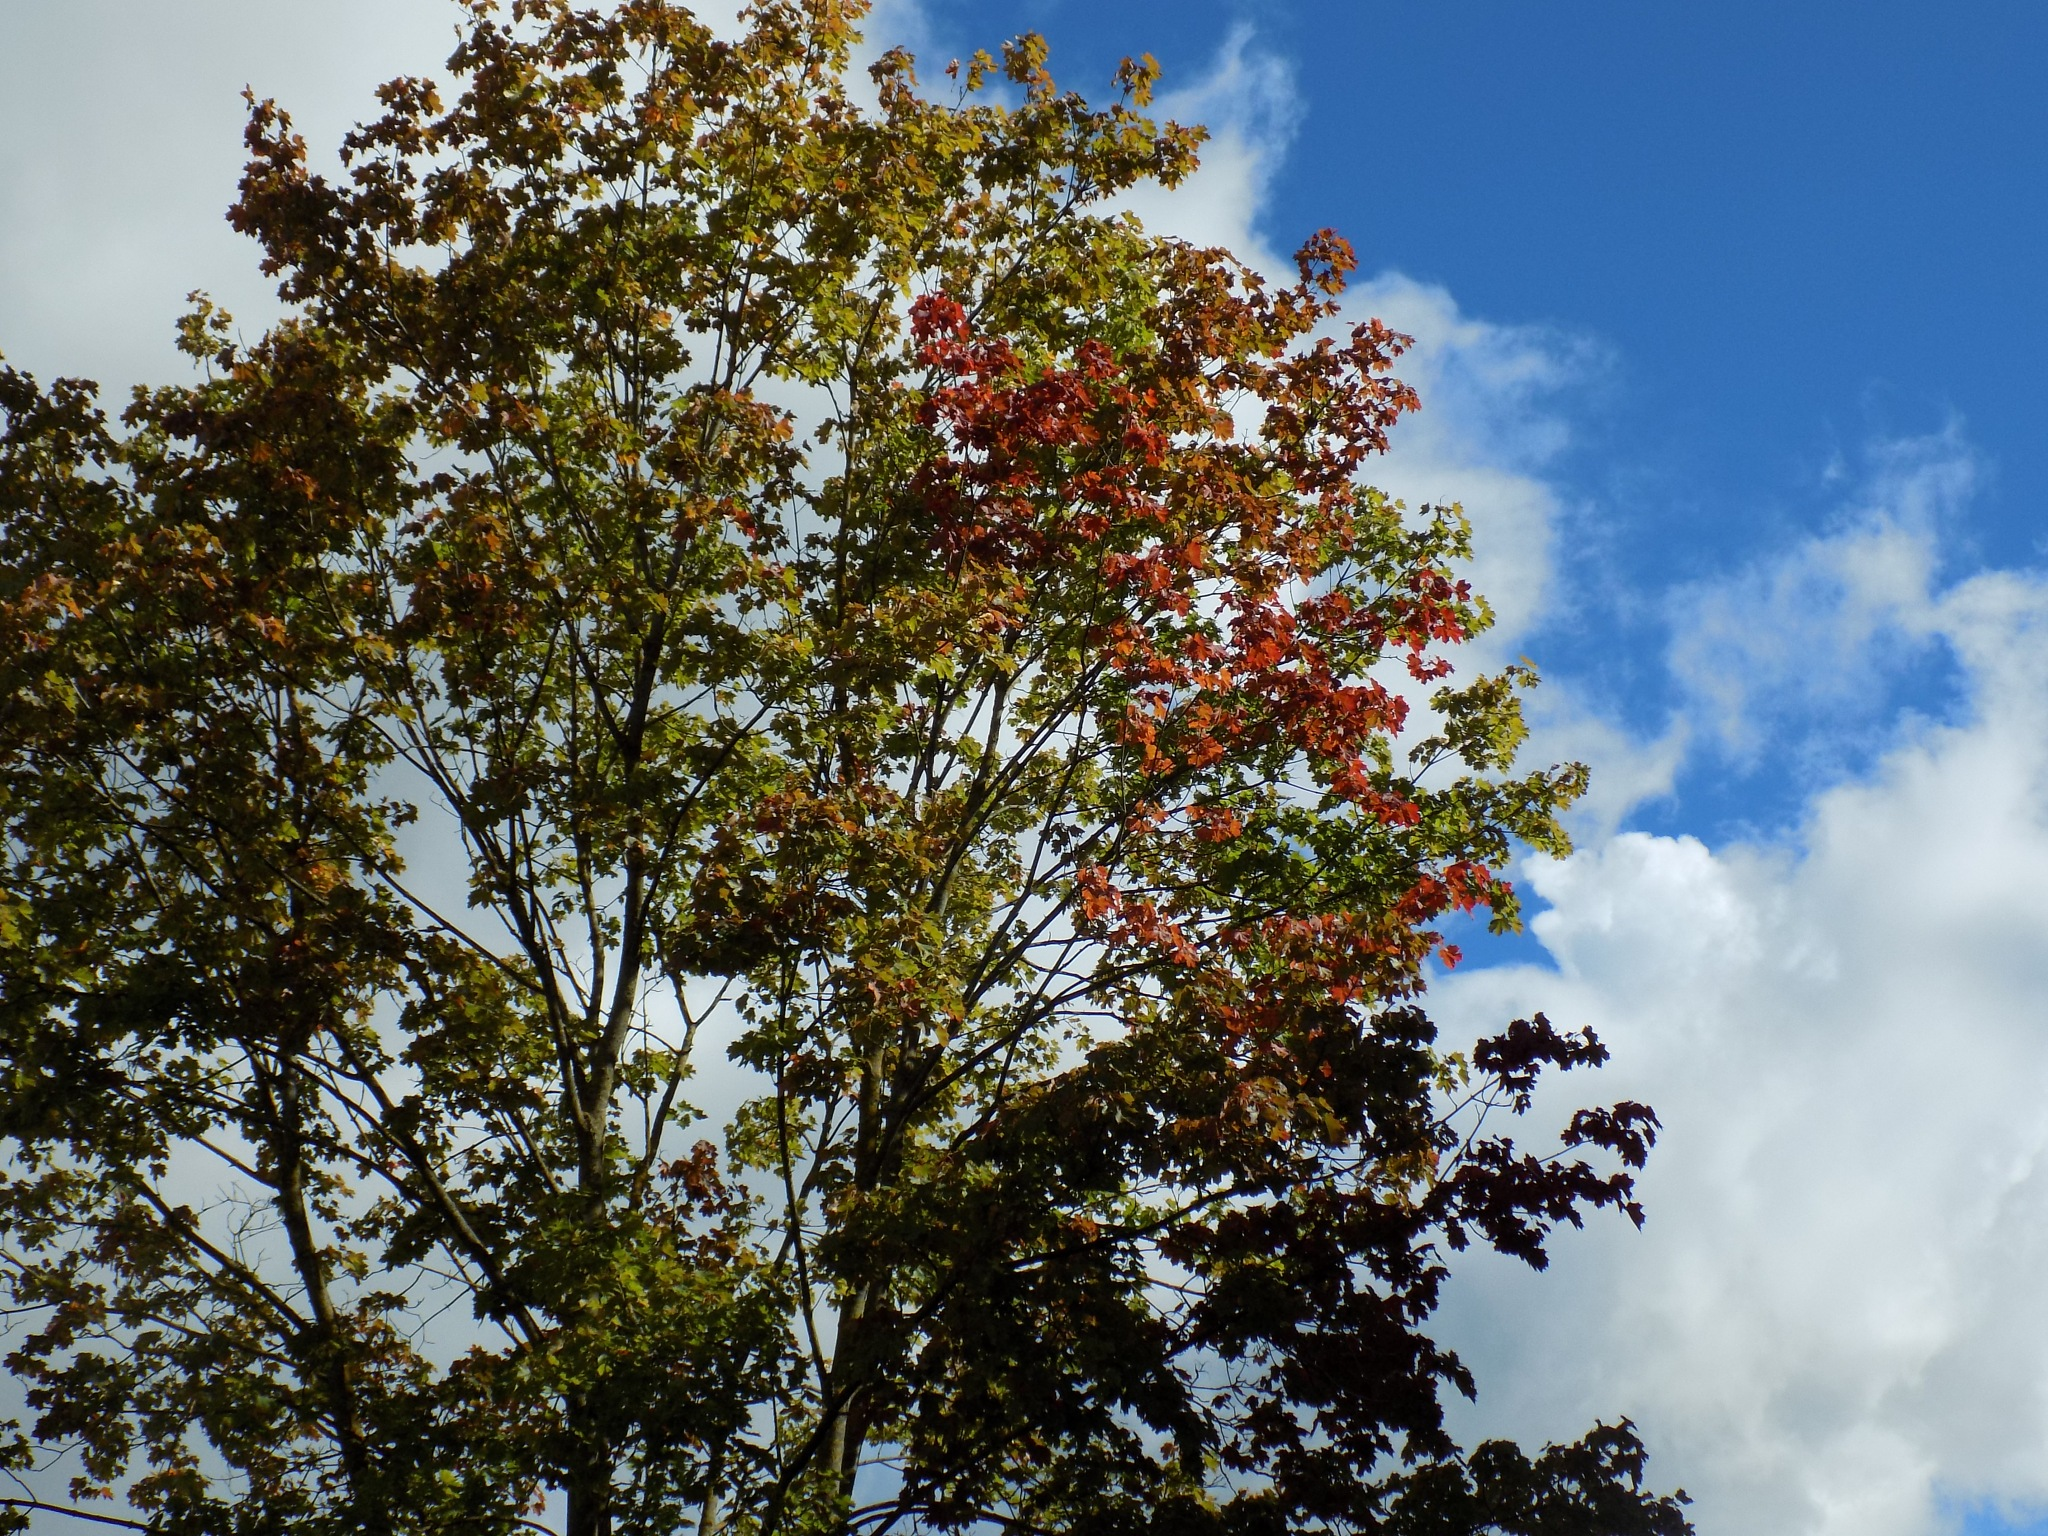 Tree and sky by uzkuraitiene62